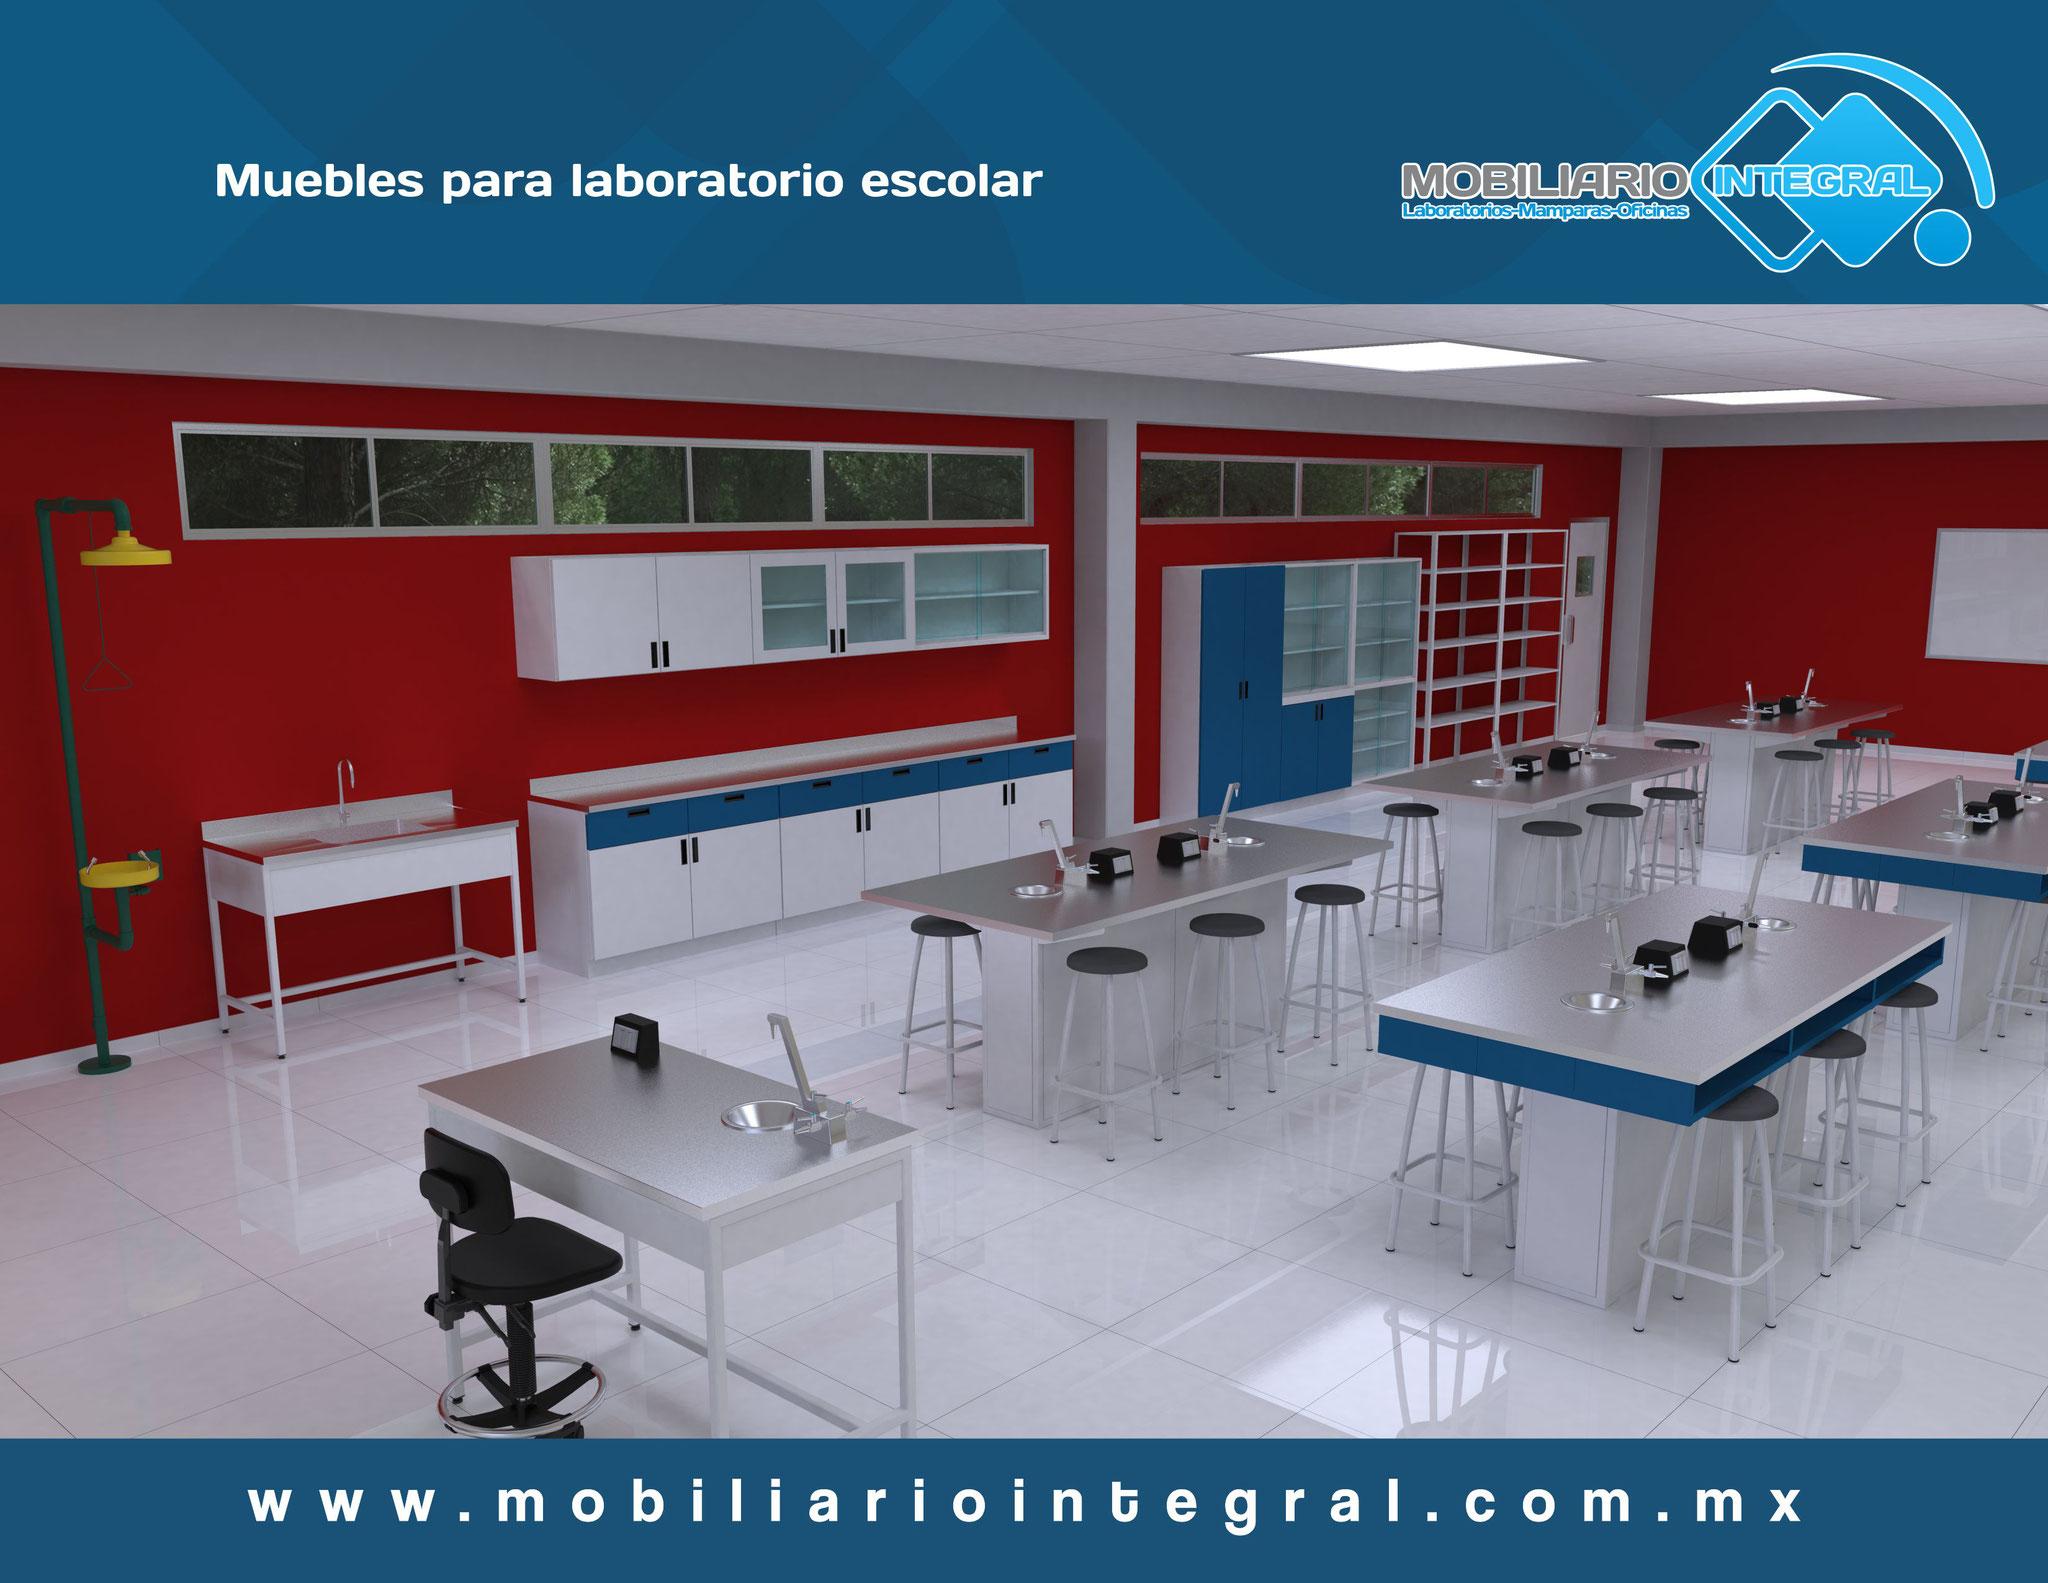 Muebles para laboratorio escolar Colima